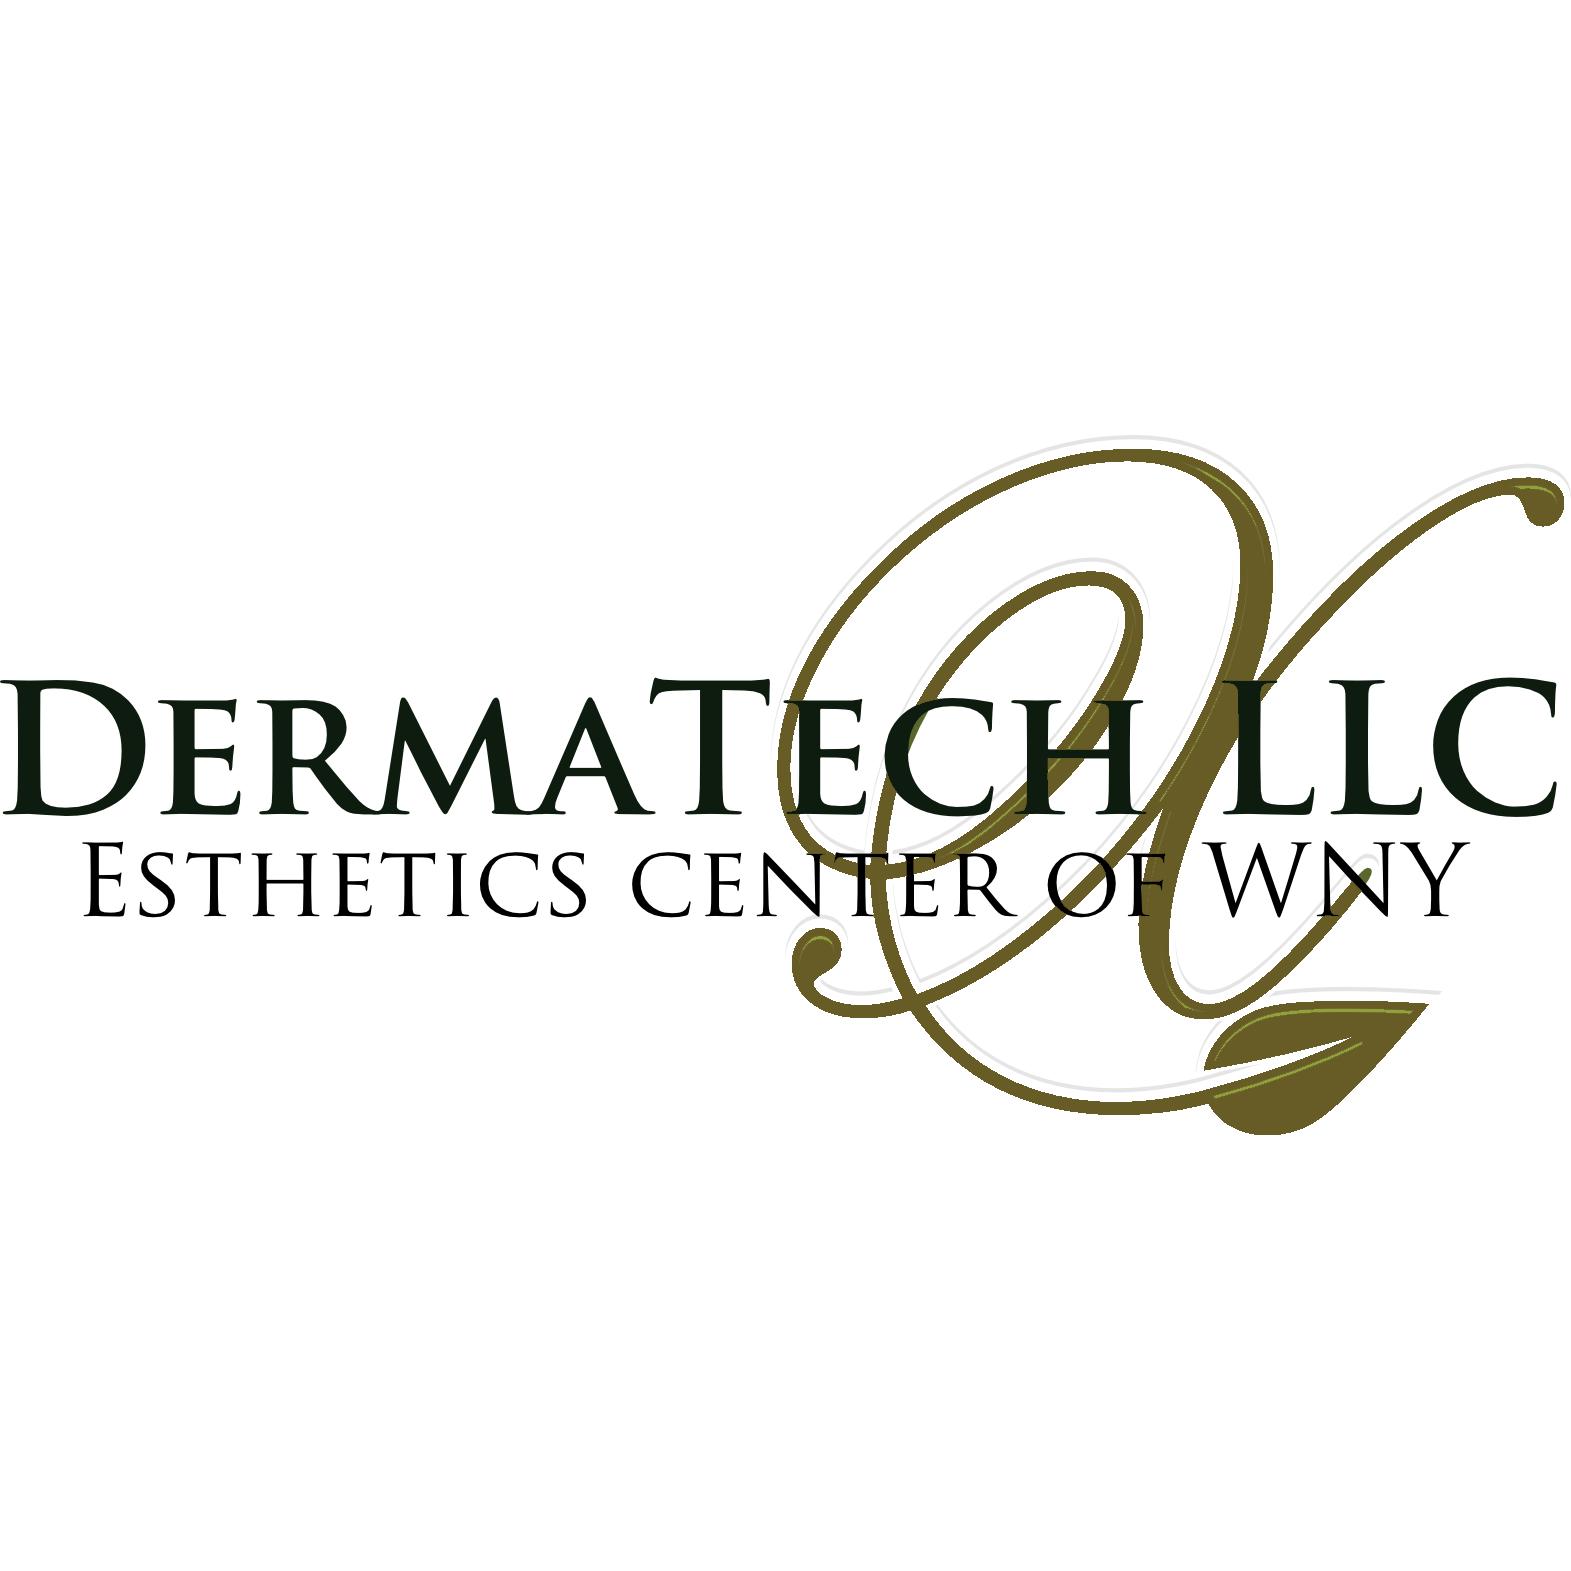 Dermatech Esthetics Center of WNY